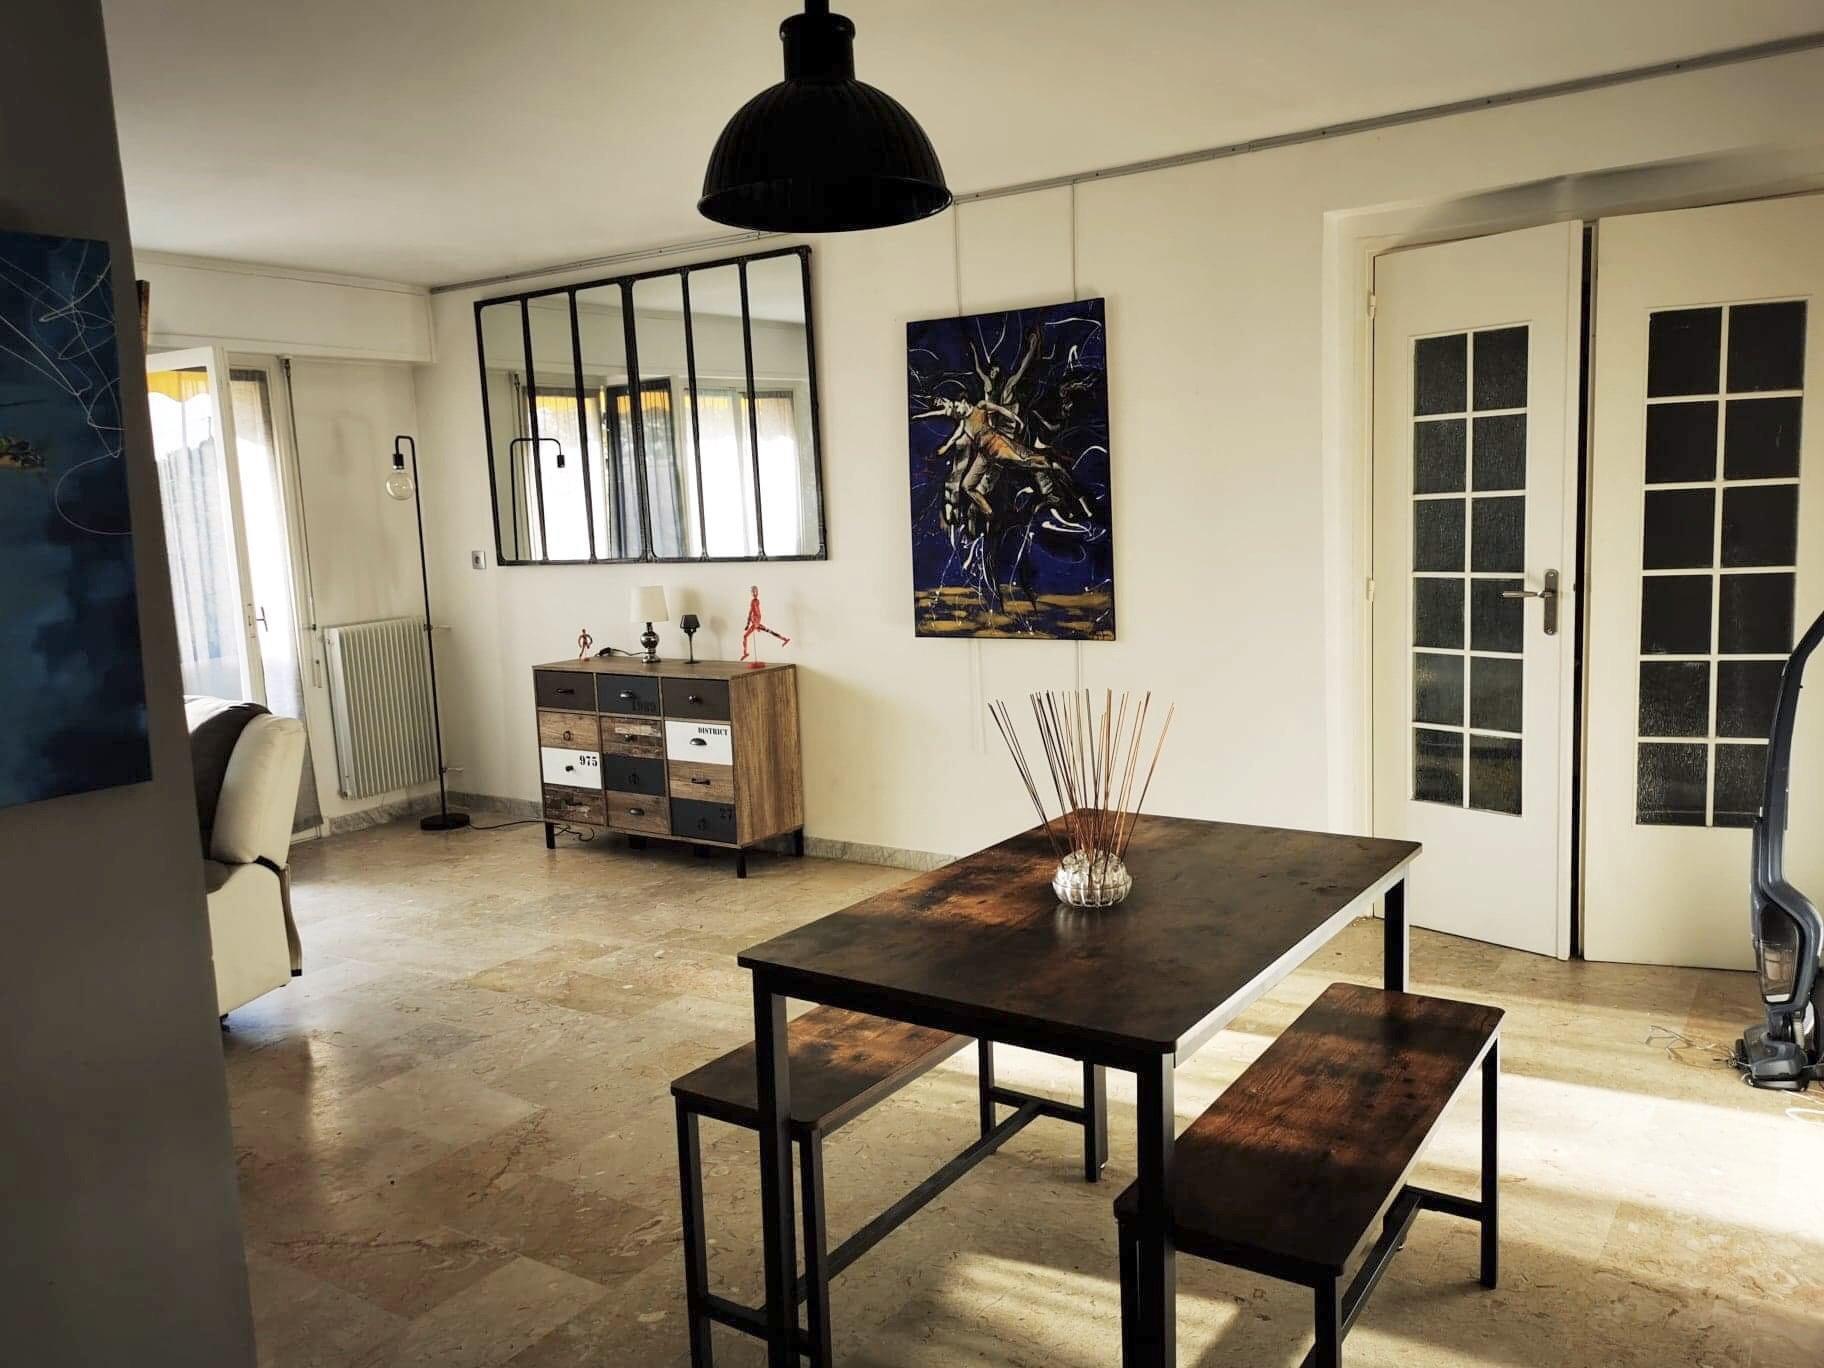 Bel & grand appartement 2Pieces meublé spacieuse terrasse